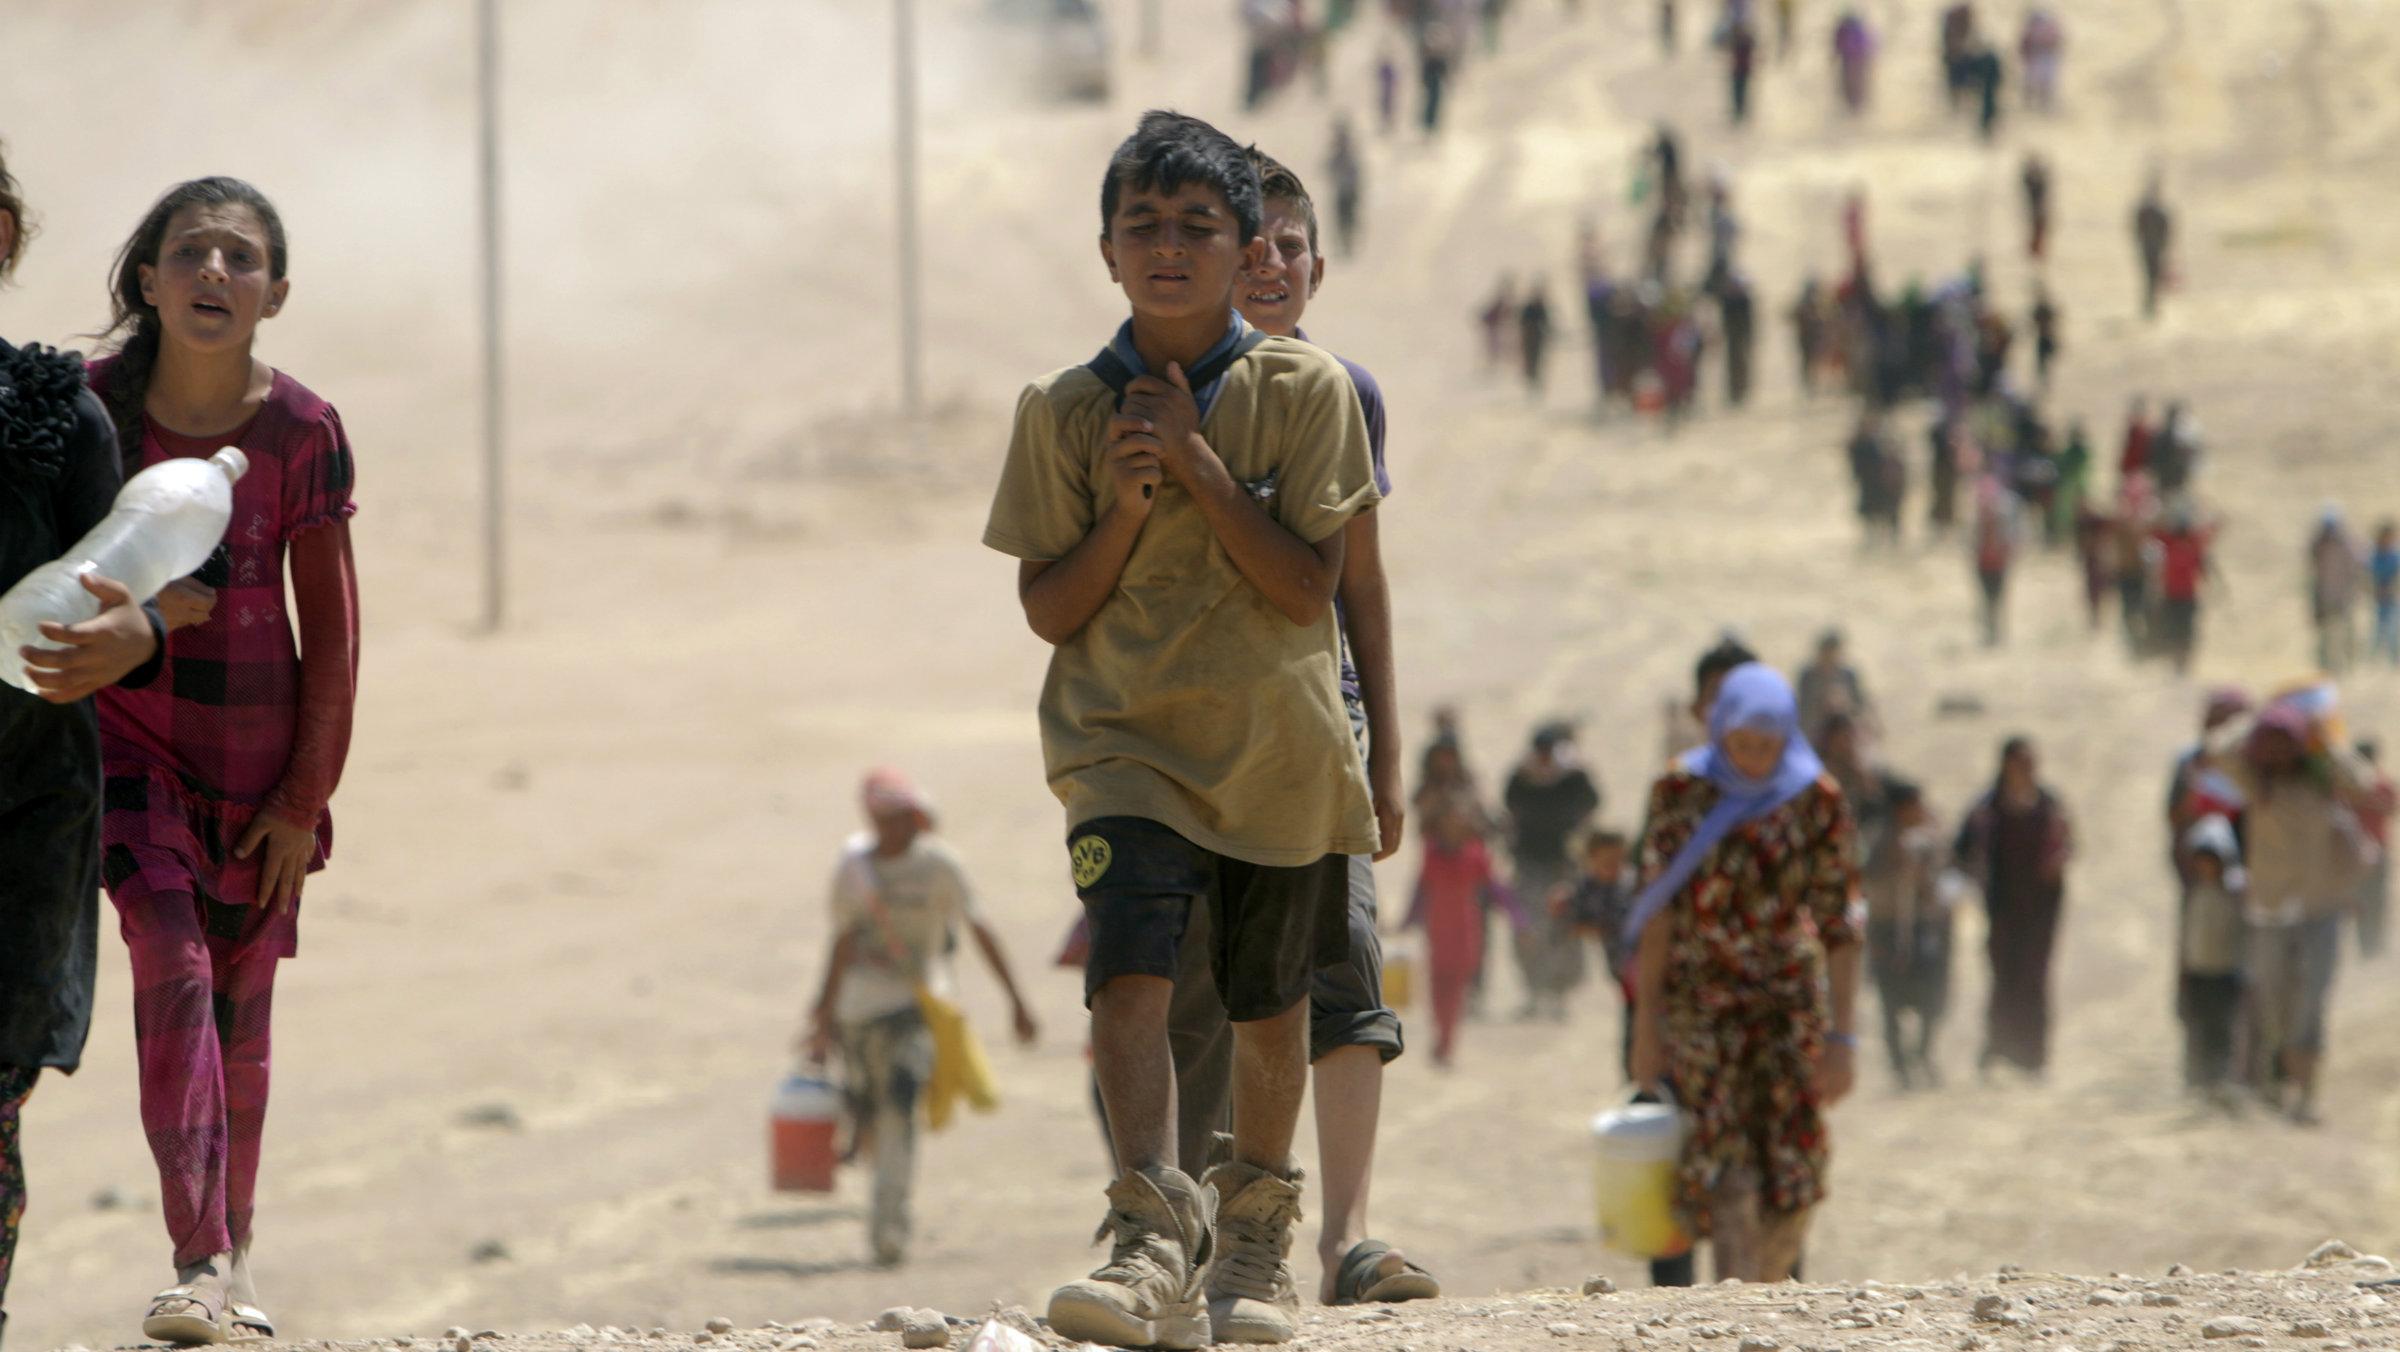 Yazidi people flee Sinjar toward the Syrian border on Aug. 10, 2014.